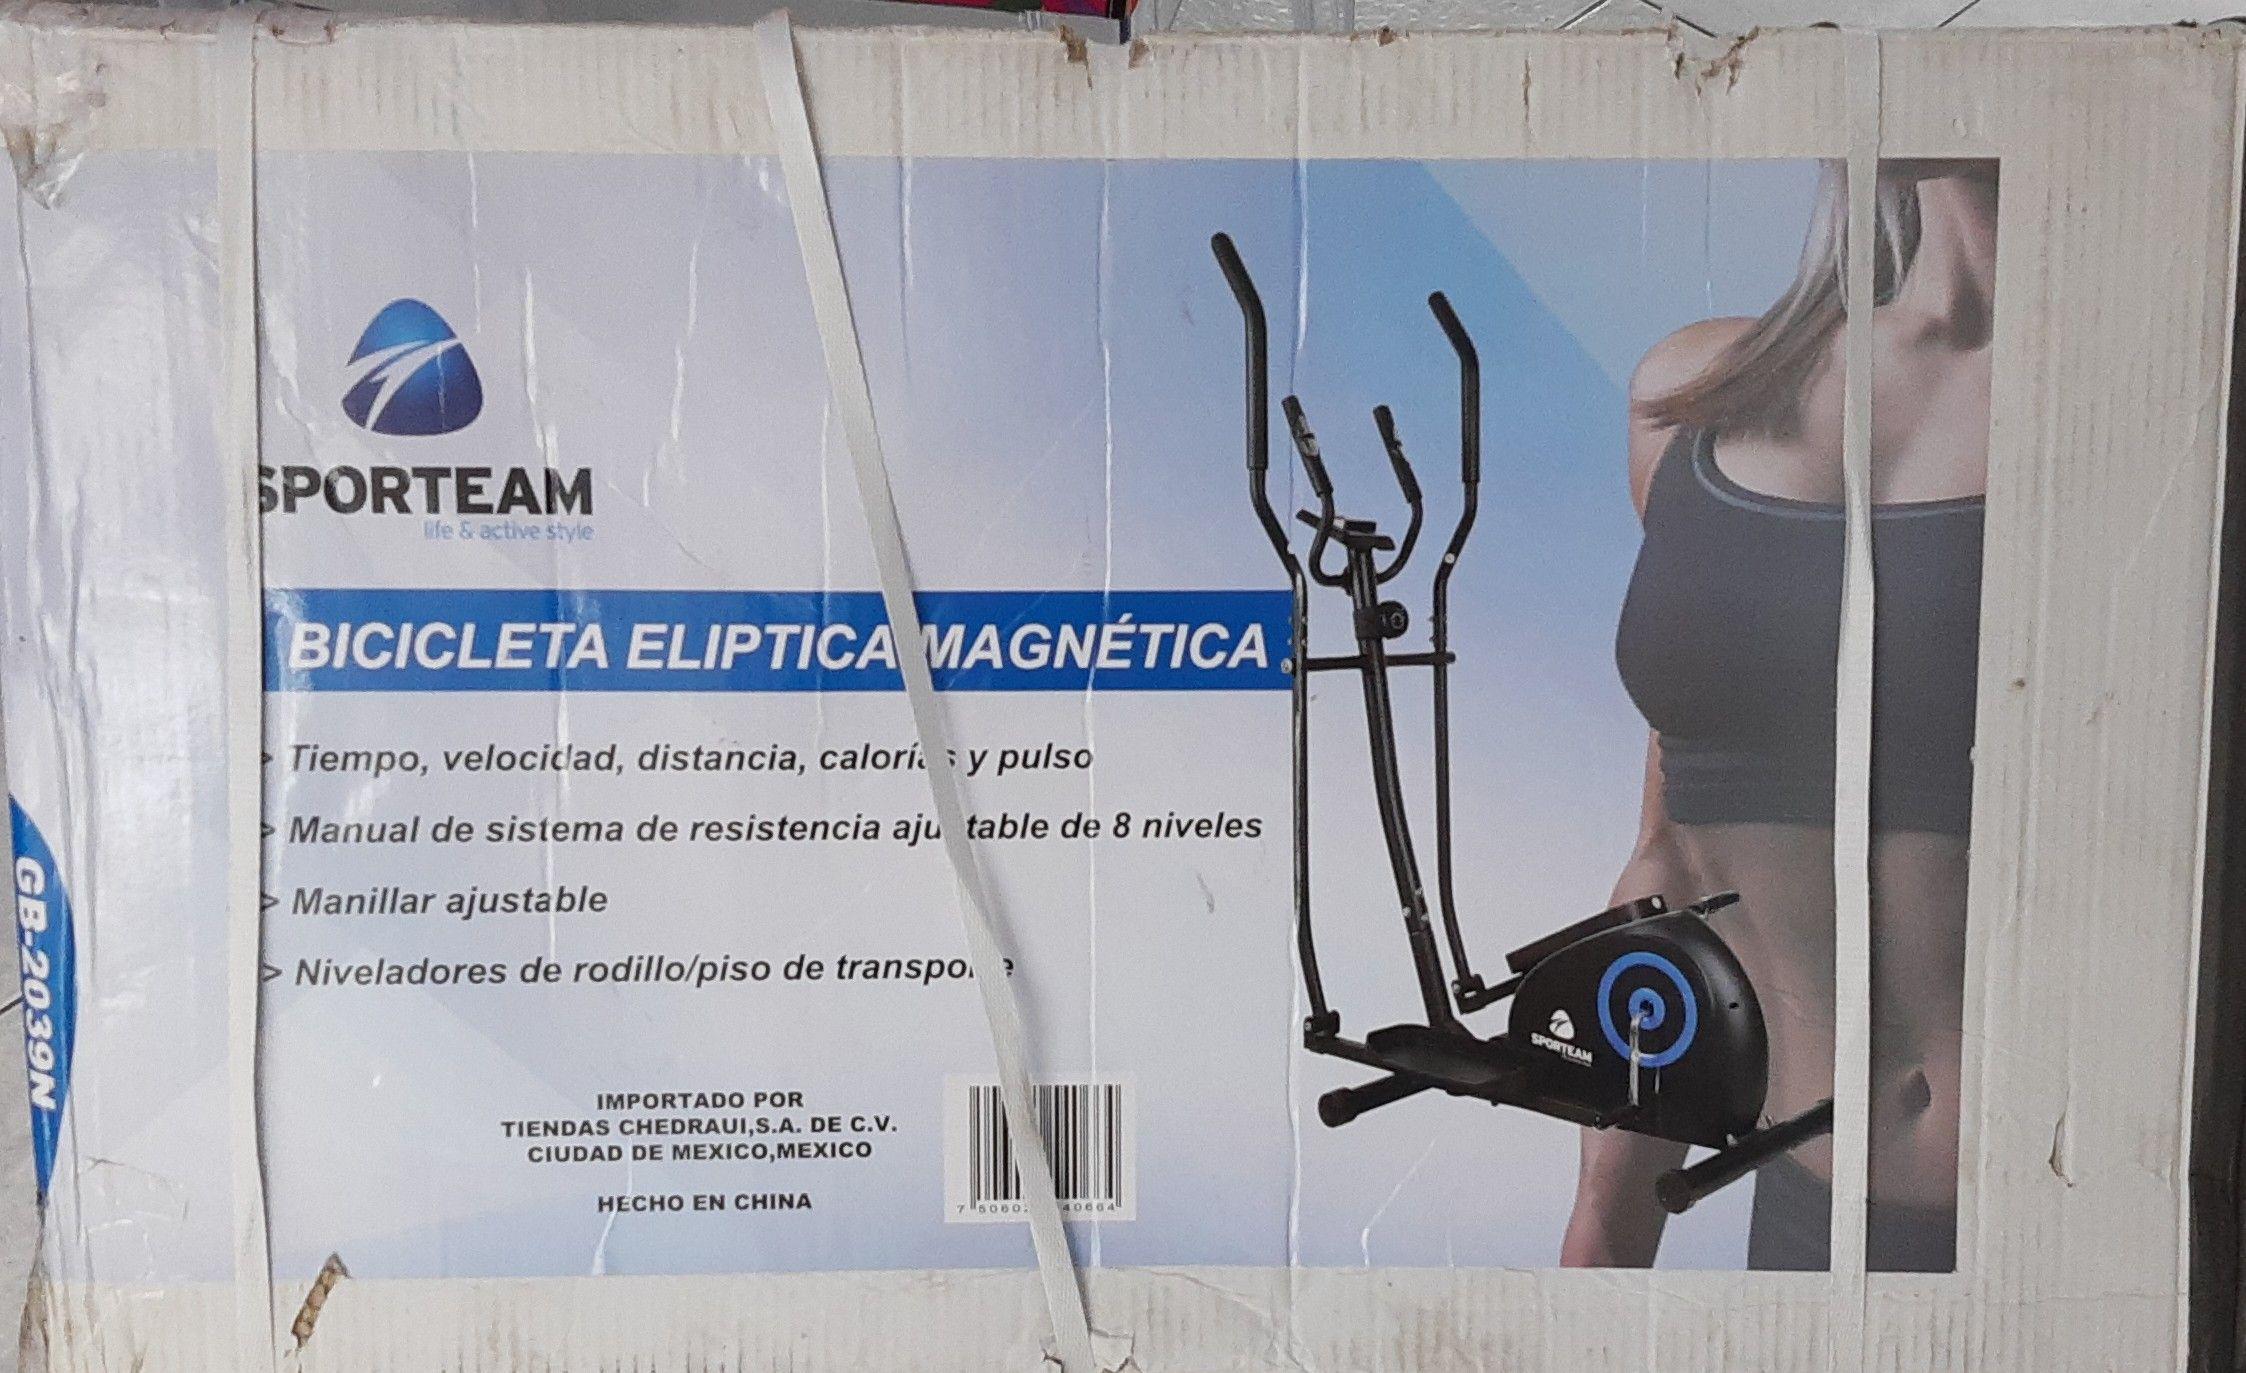 Chedraui bicicleta eliptica magnética GB 2039N